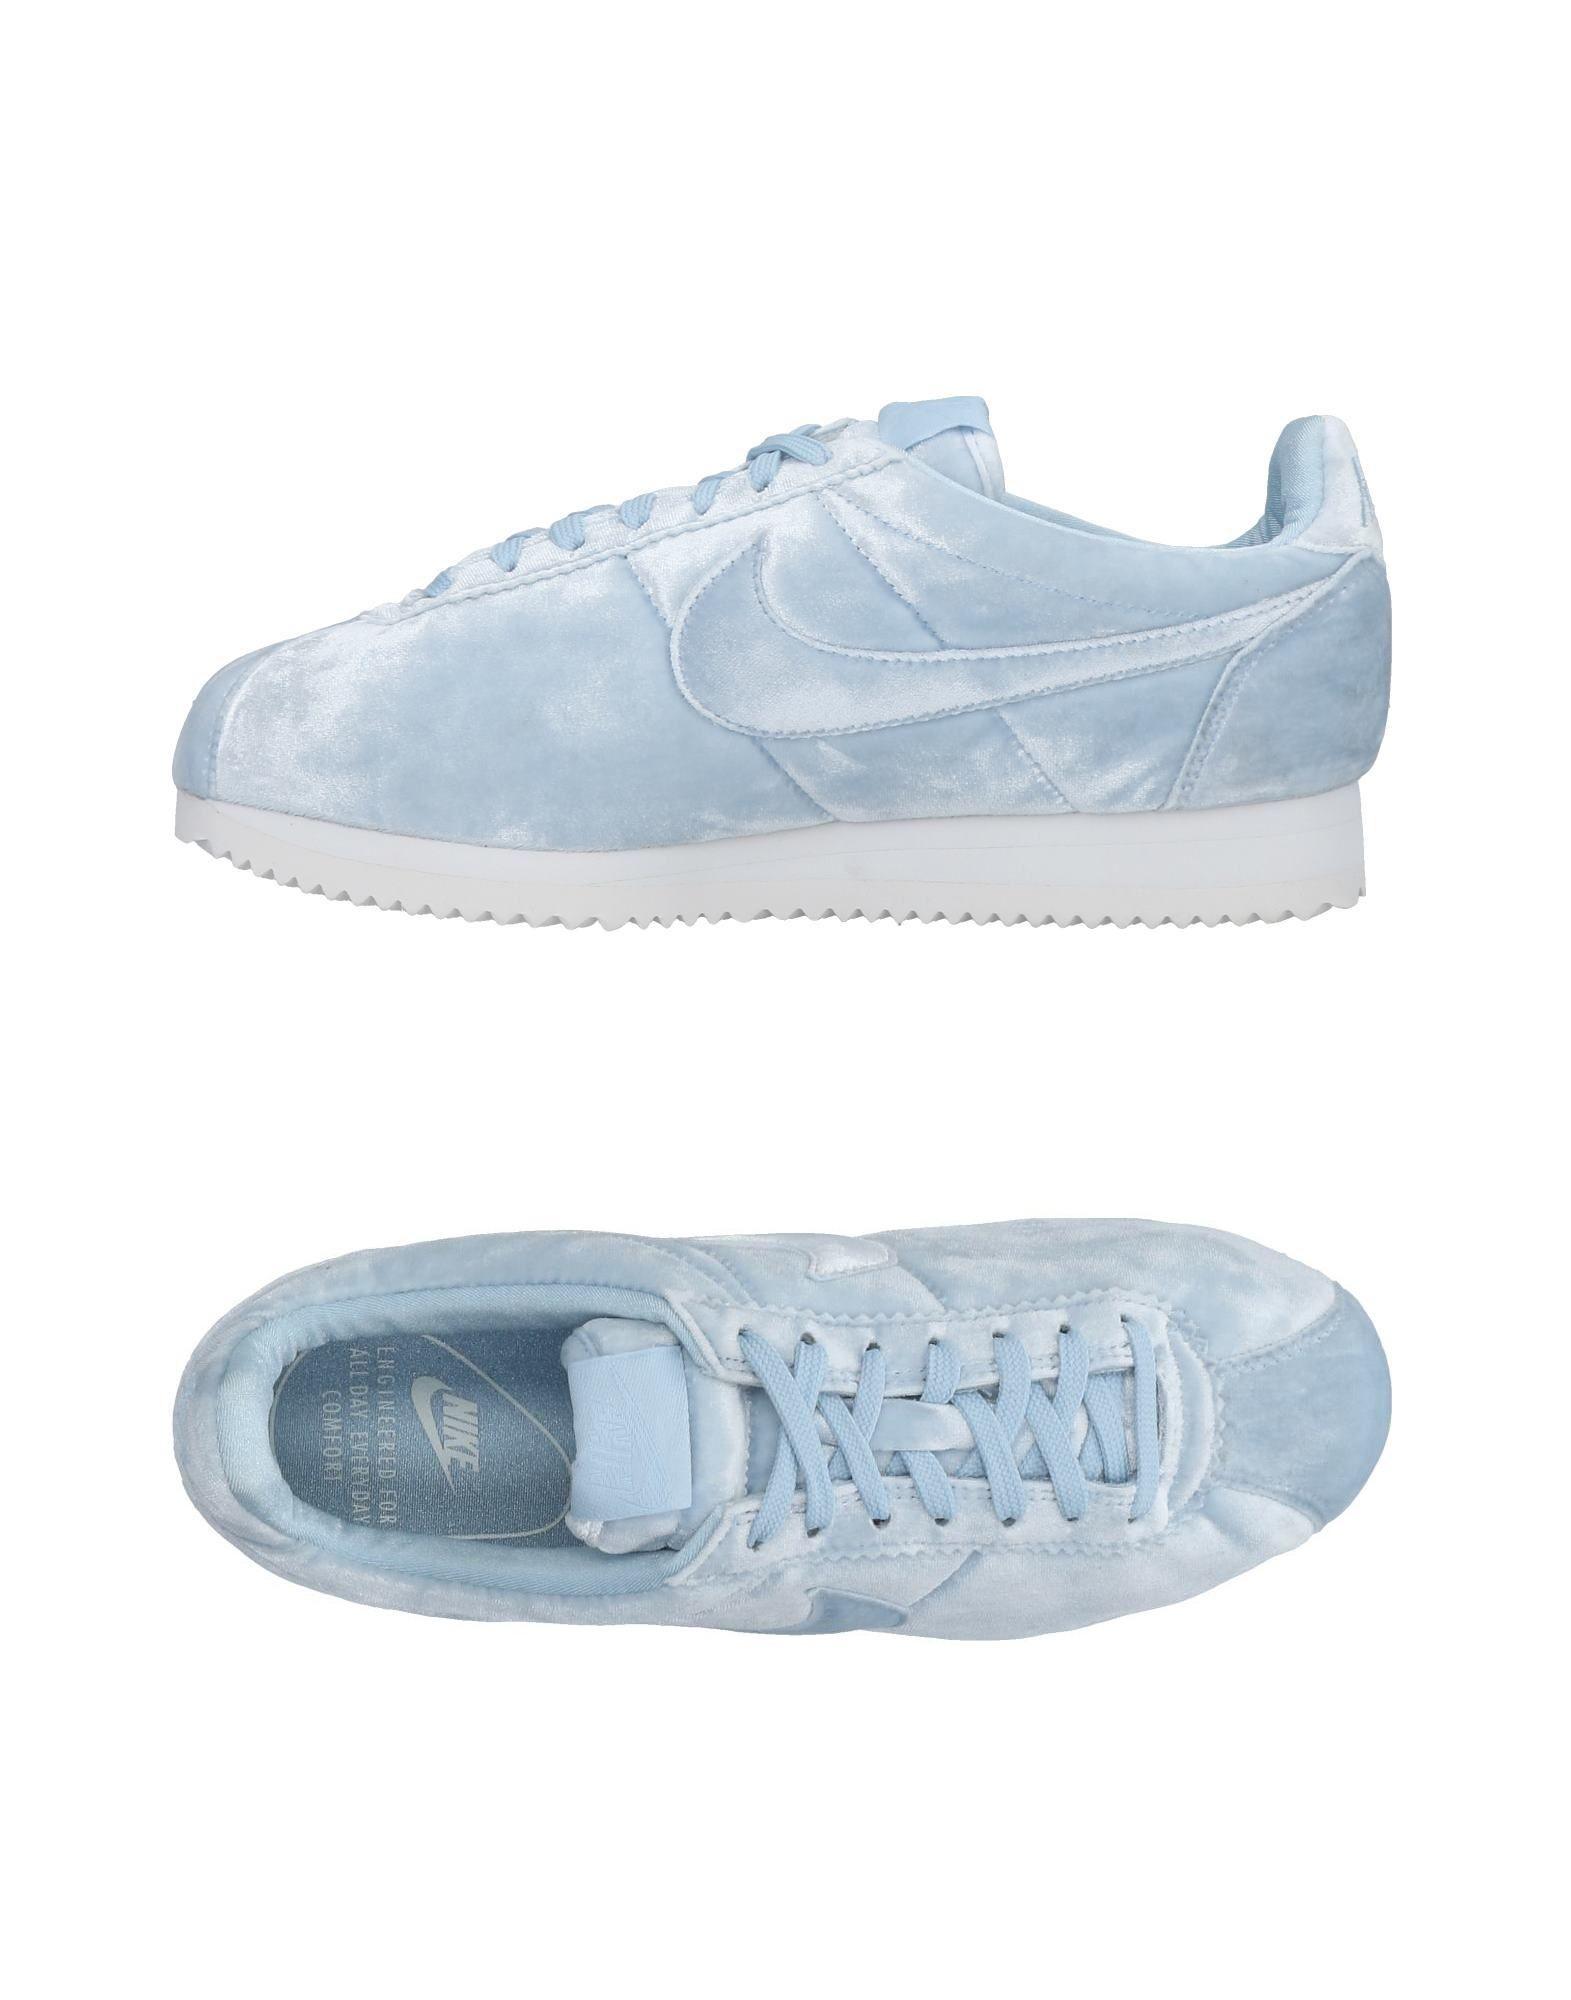 Nike Sneakers Gute Damen  11480260DK Gute Sneakers Qualität beliebte Schuhe e186f2